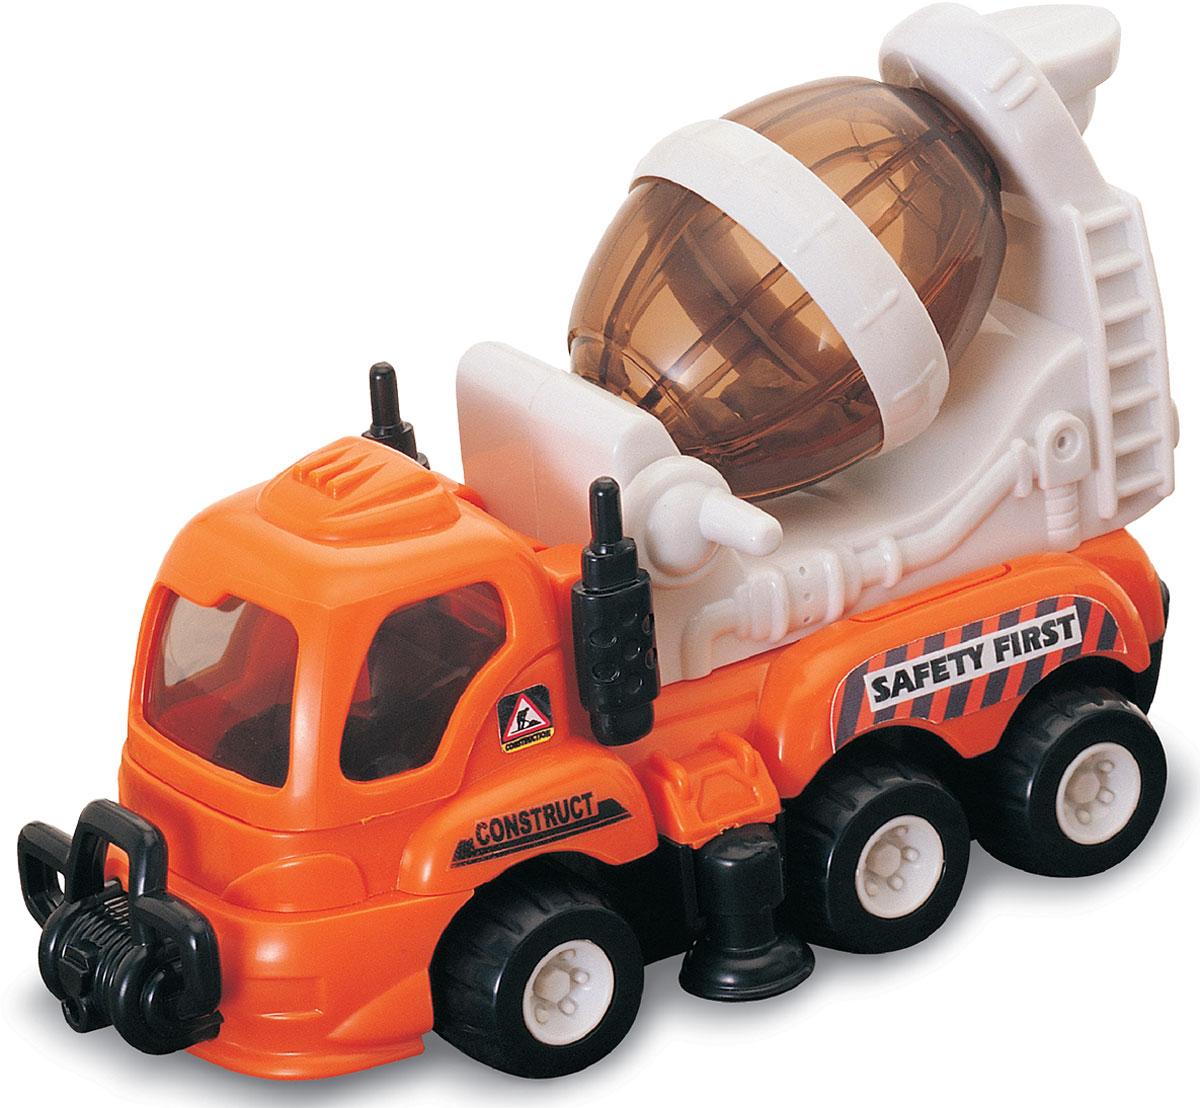 Keenway Бетономешалка Construction keenway экскаватор construction truck 30319